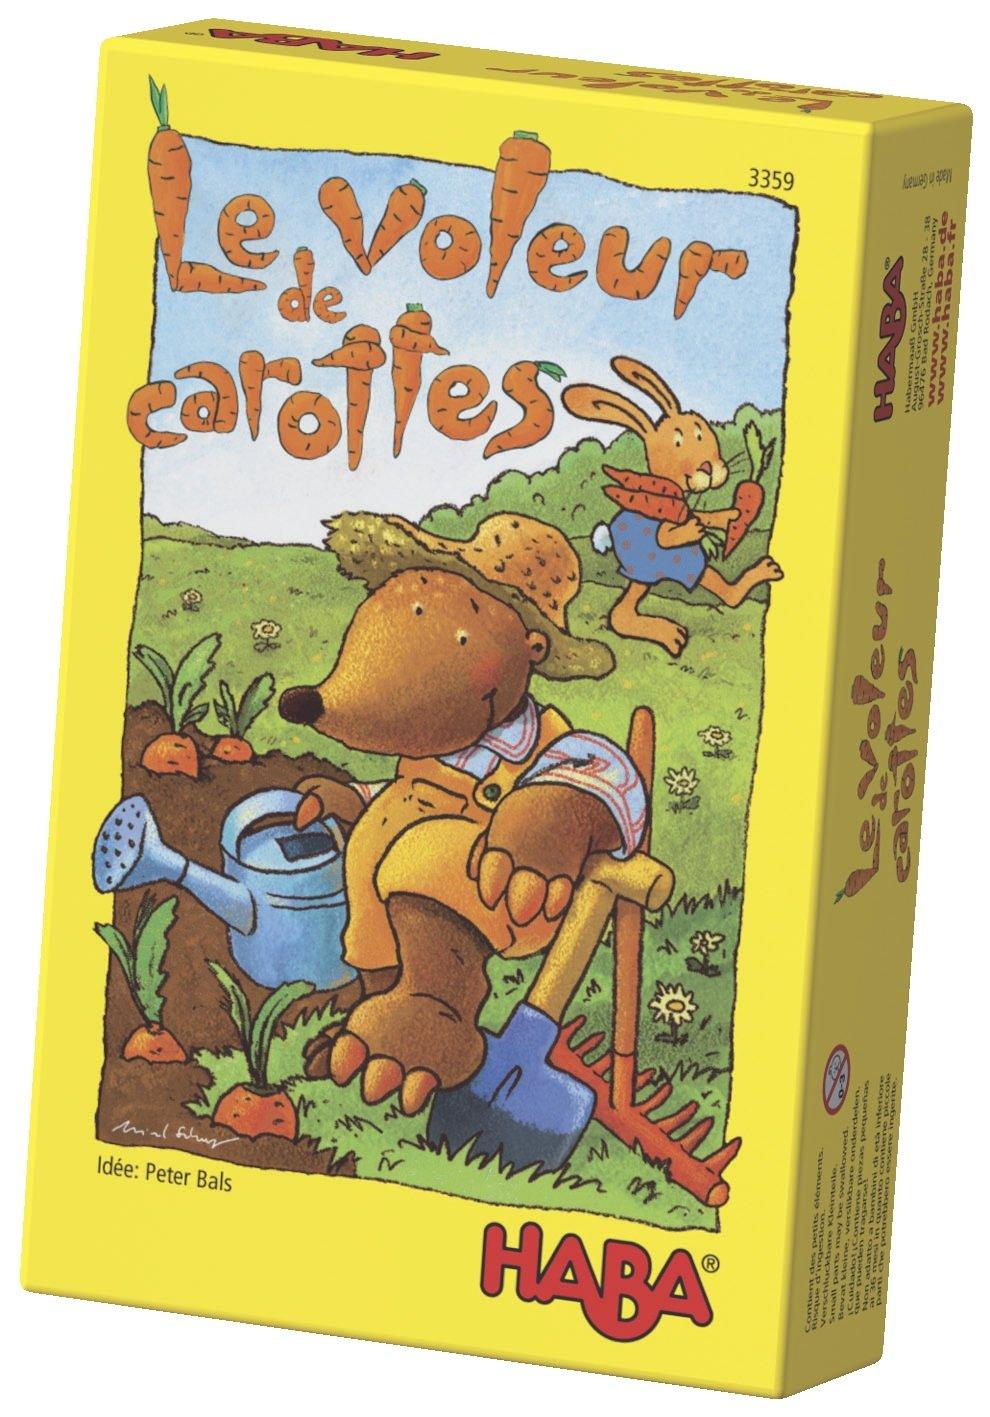 Haba - Le Voleur de Carottes, 003359